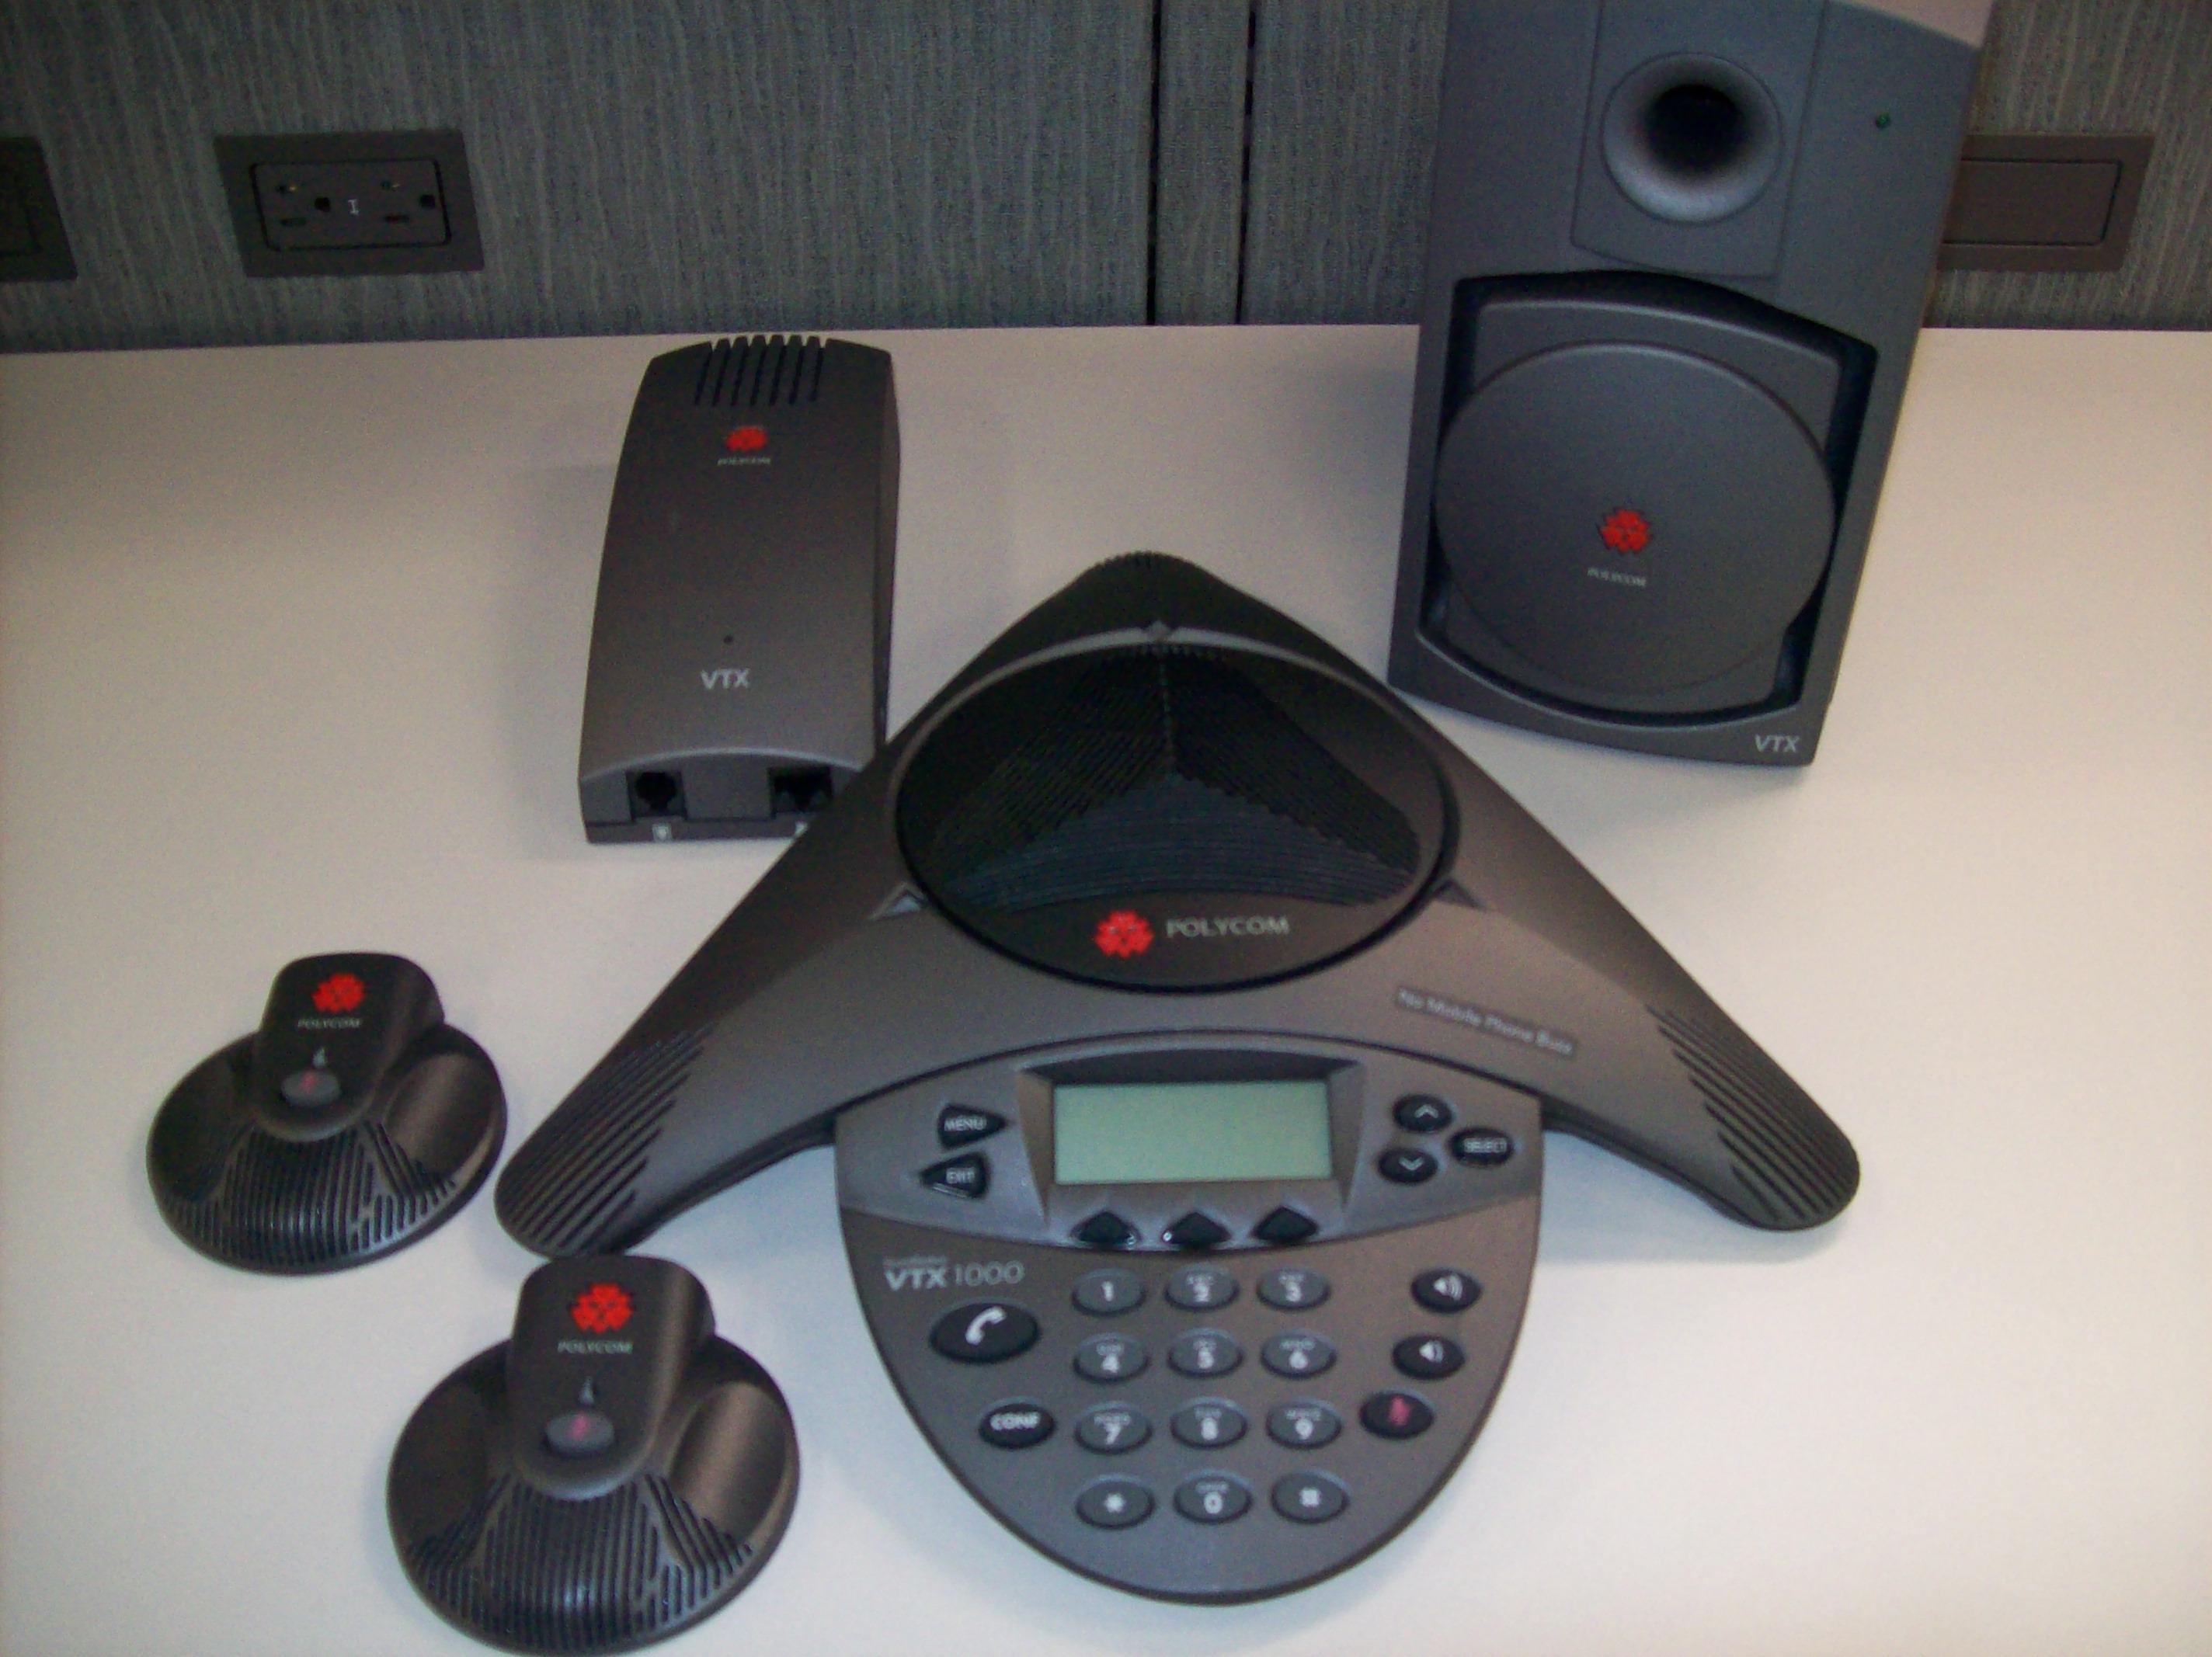 Polycom SoundStation VTX 1000 Interface The College at